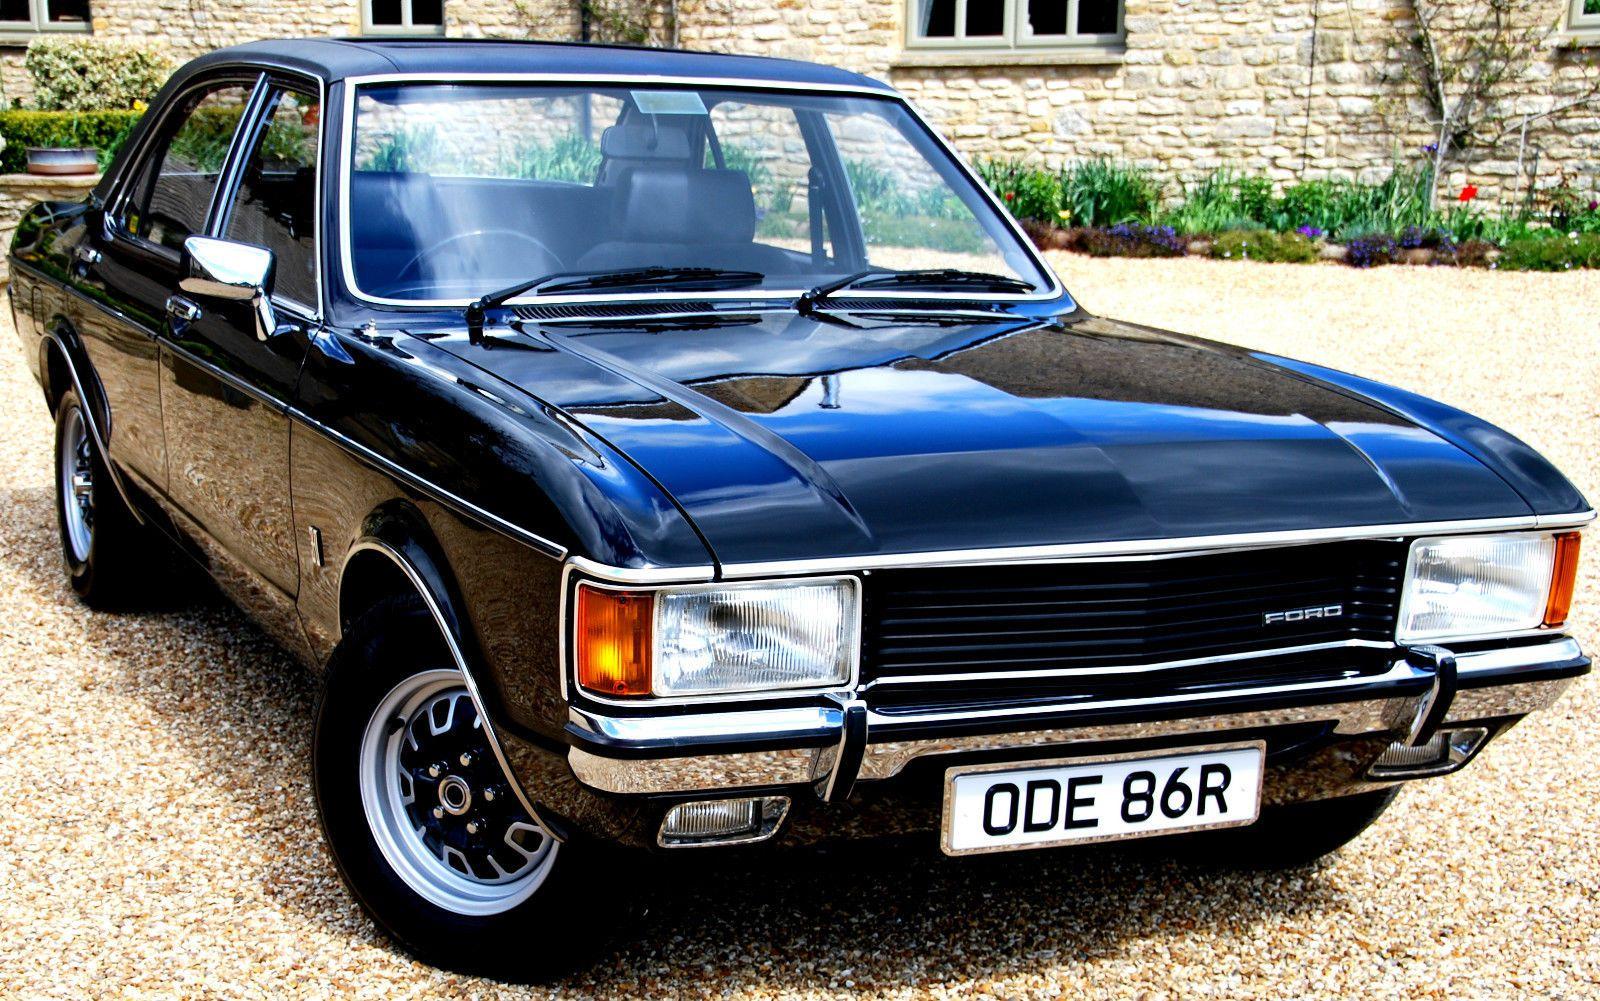 1977 Mk1 Ford Granada 3 0l Gl Auto Just 33 000 Miles Ford Granada Car Ford Classic Motors